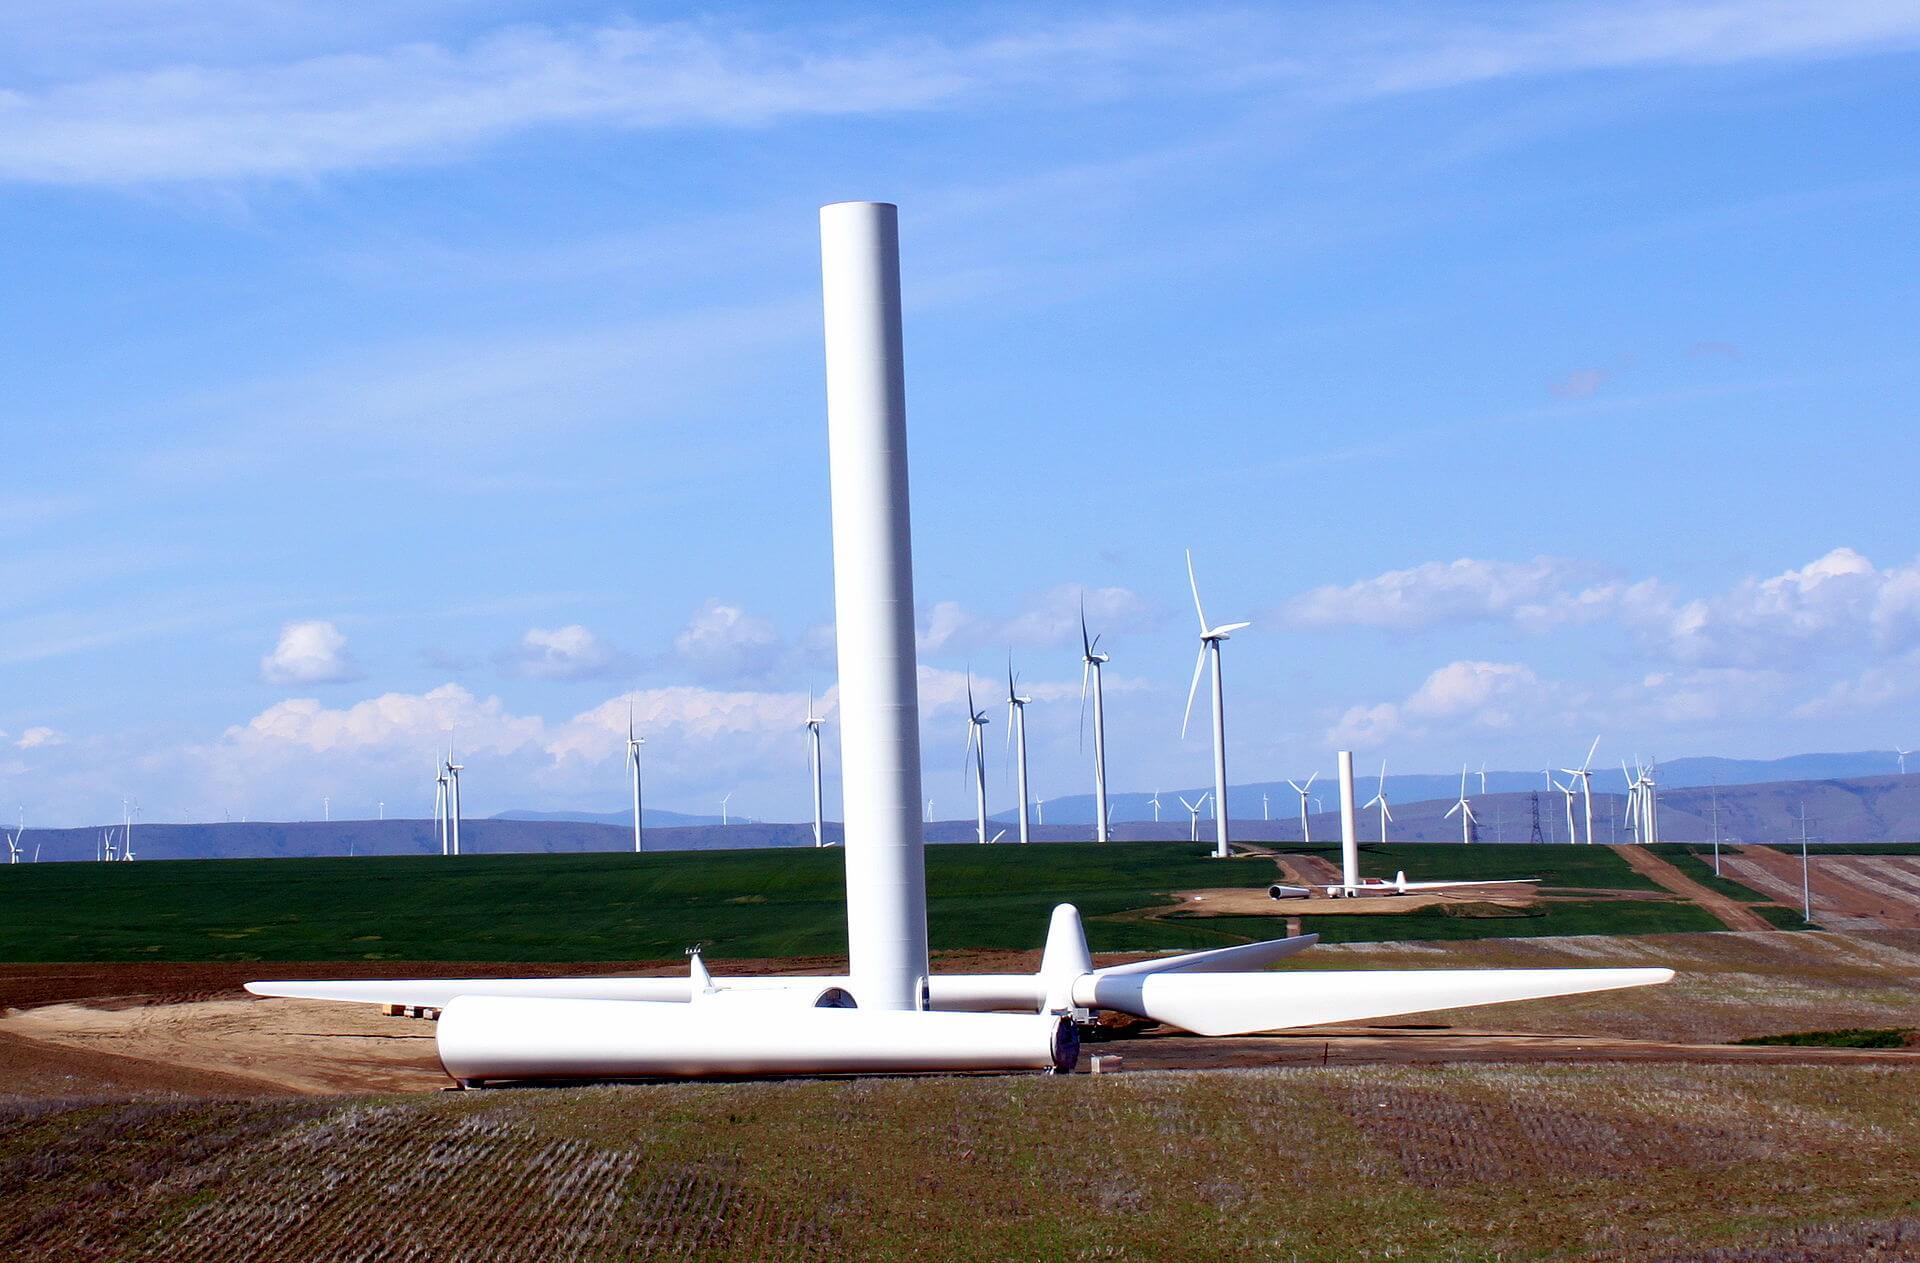 wind turbine gearbox oil contamination